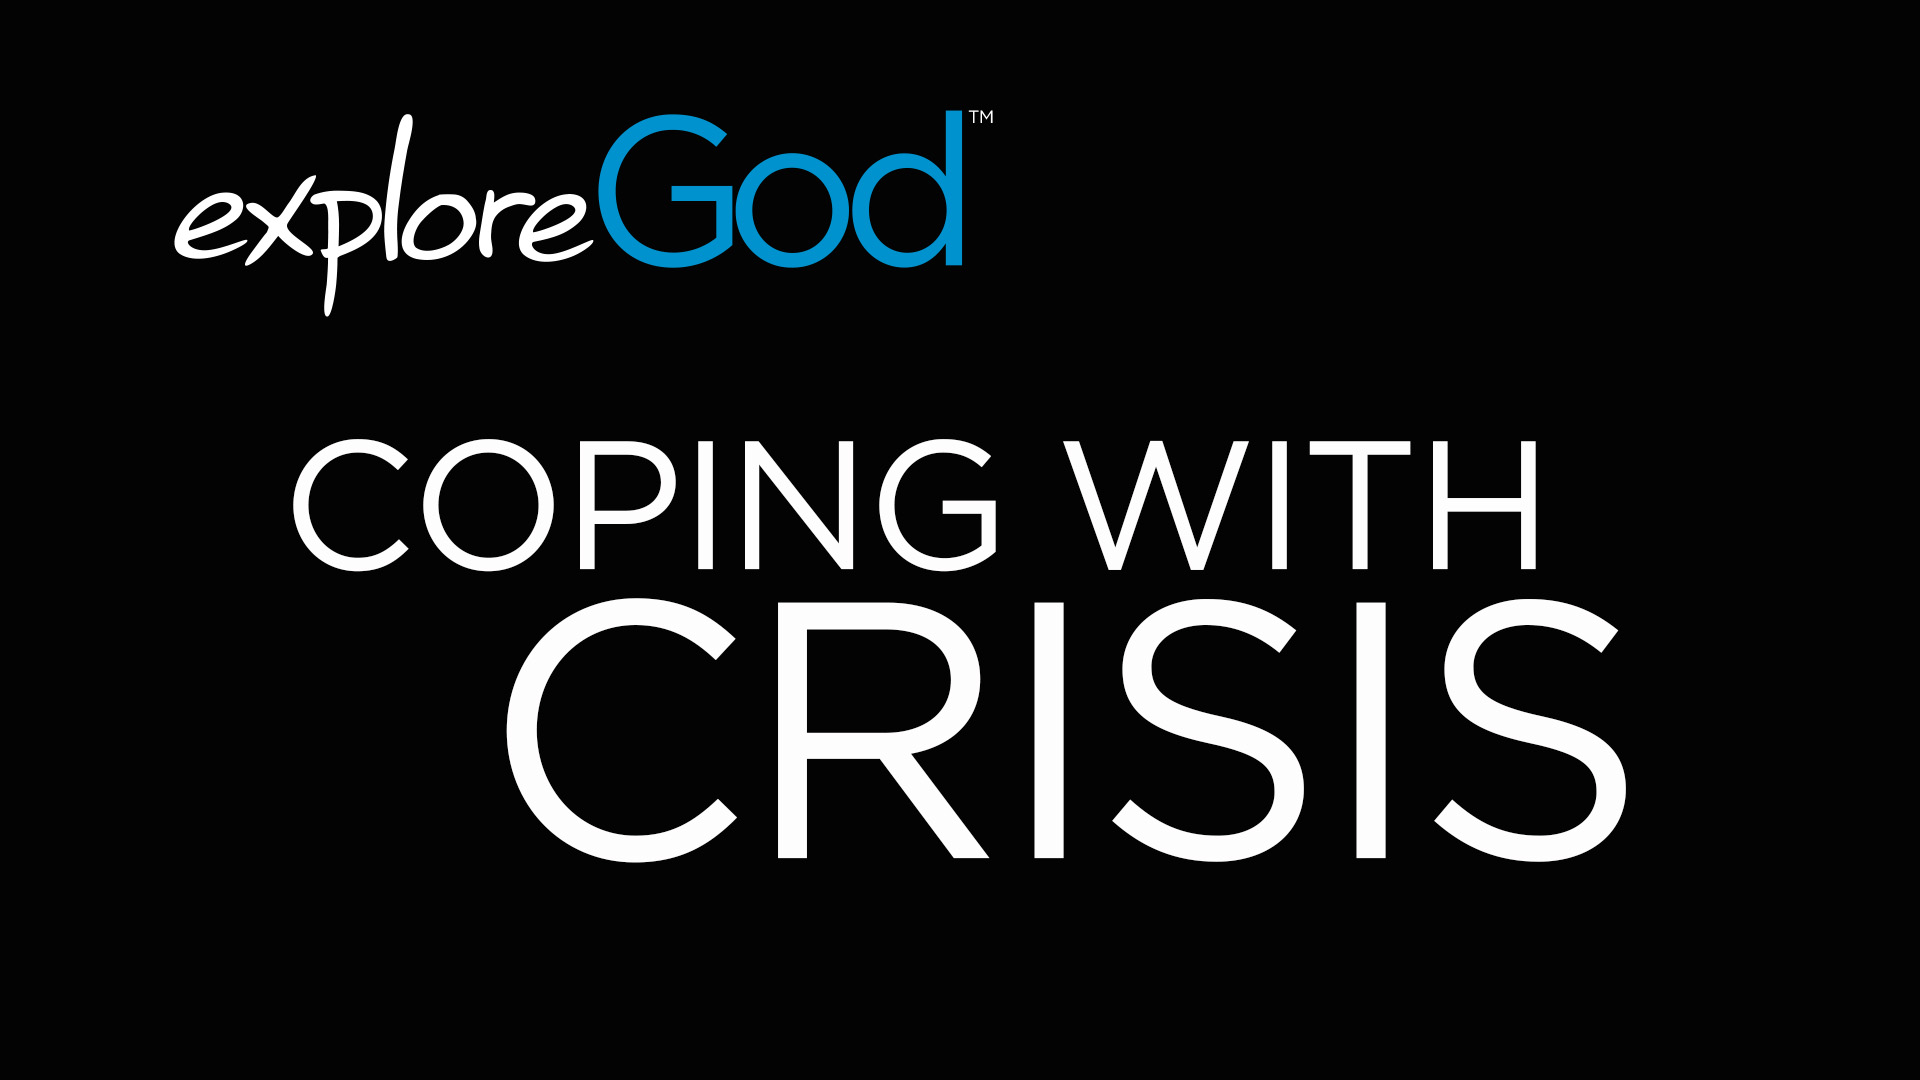 Explore God Image for depression page